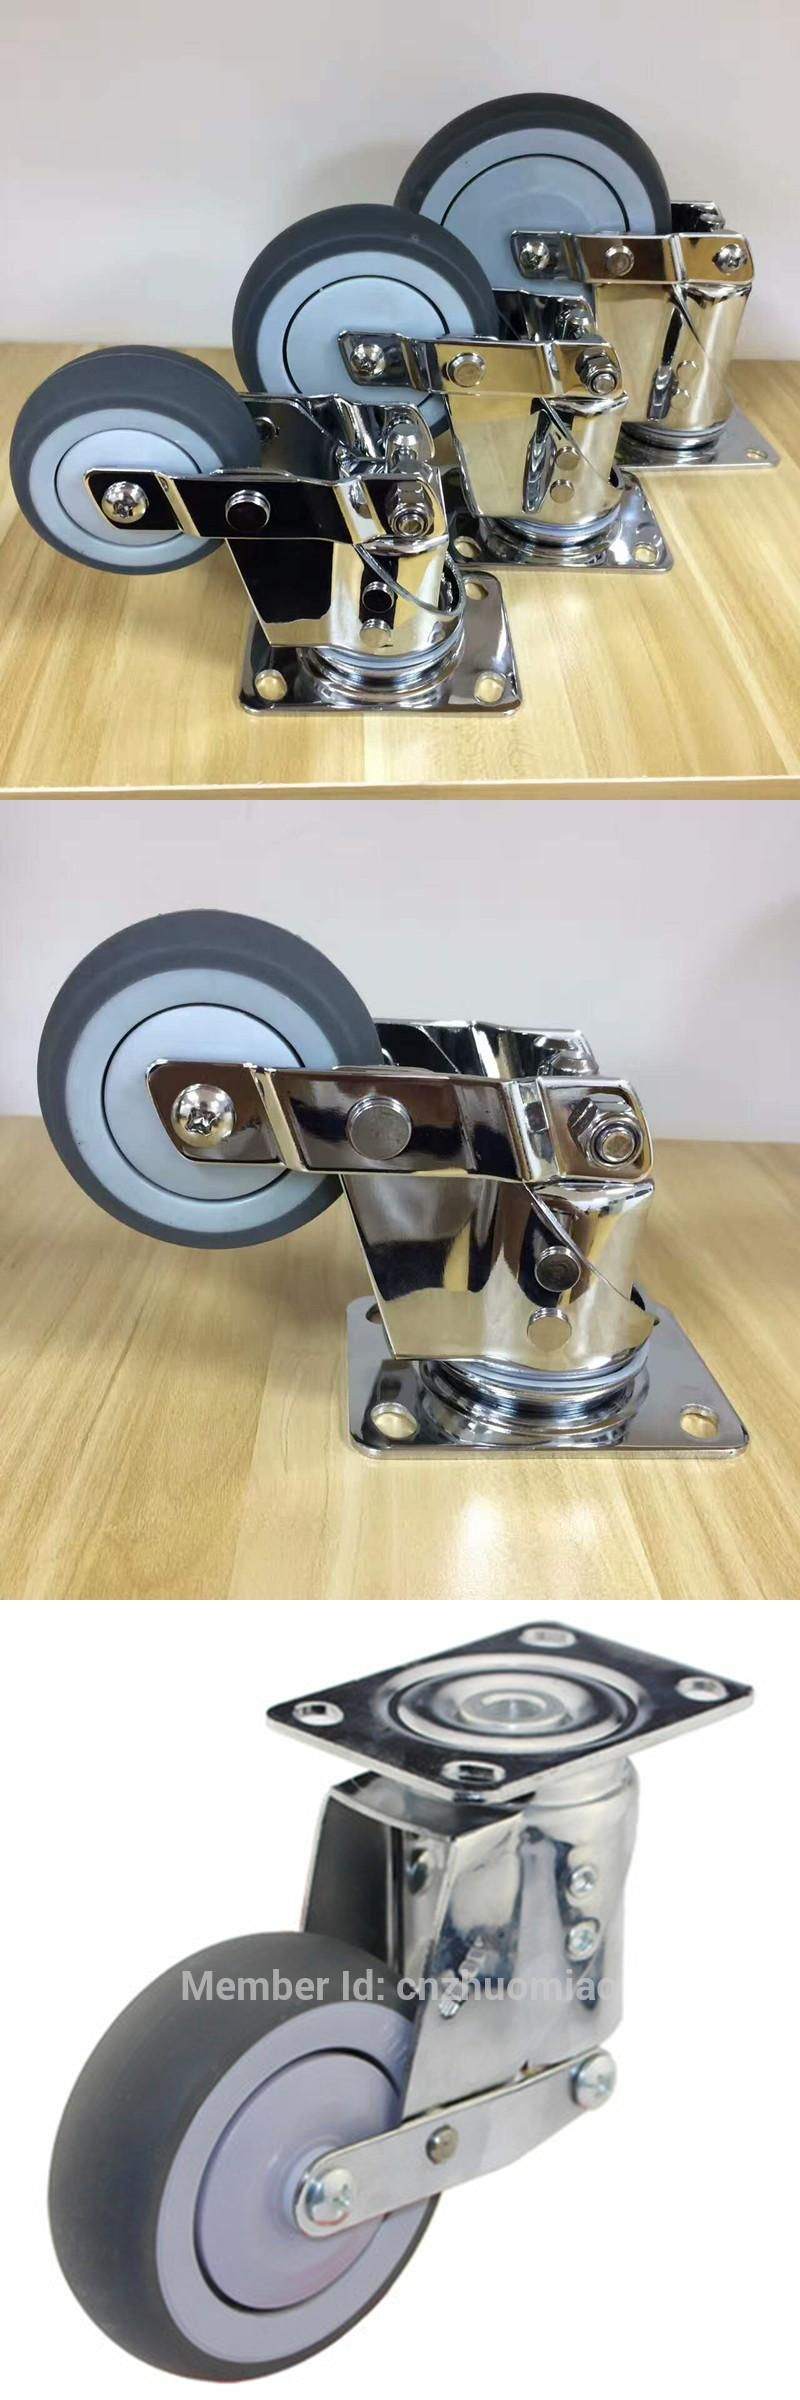 4 Pcs Medium Duty Brake Swivel 125mm Tpr On Pp Shock Absorber Castor Wheel With Images Castors Wheels Castor Swivel